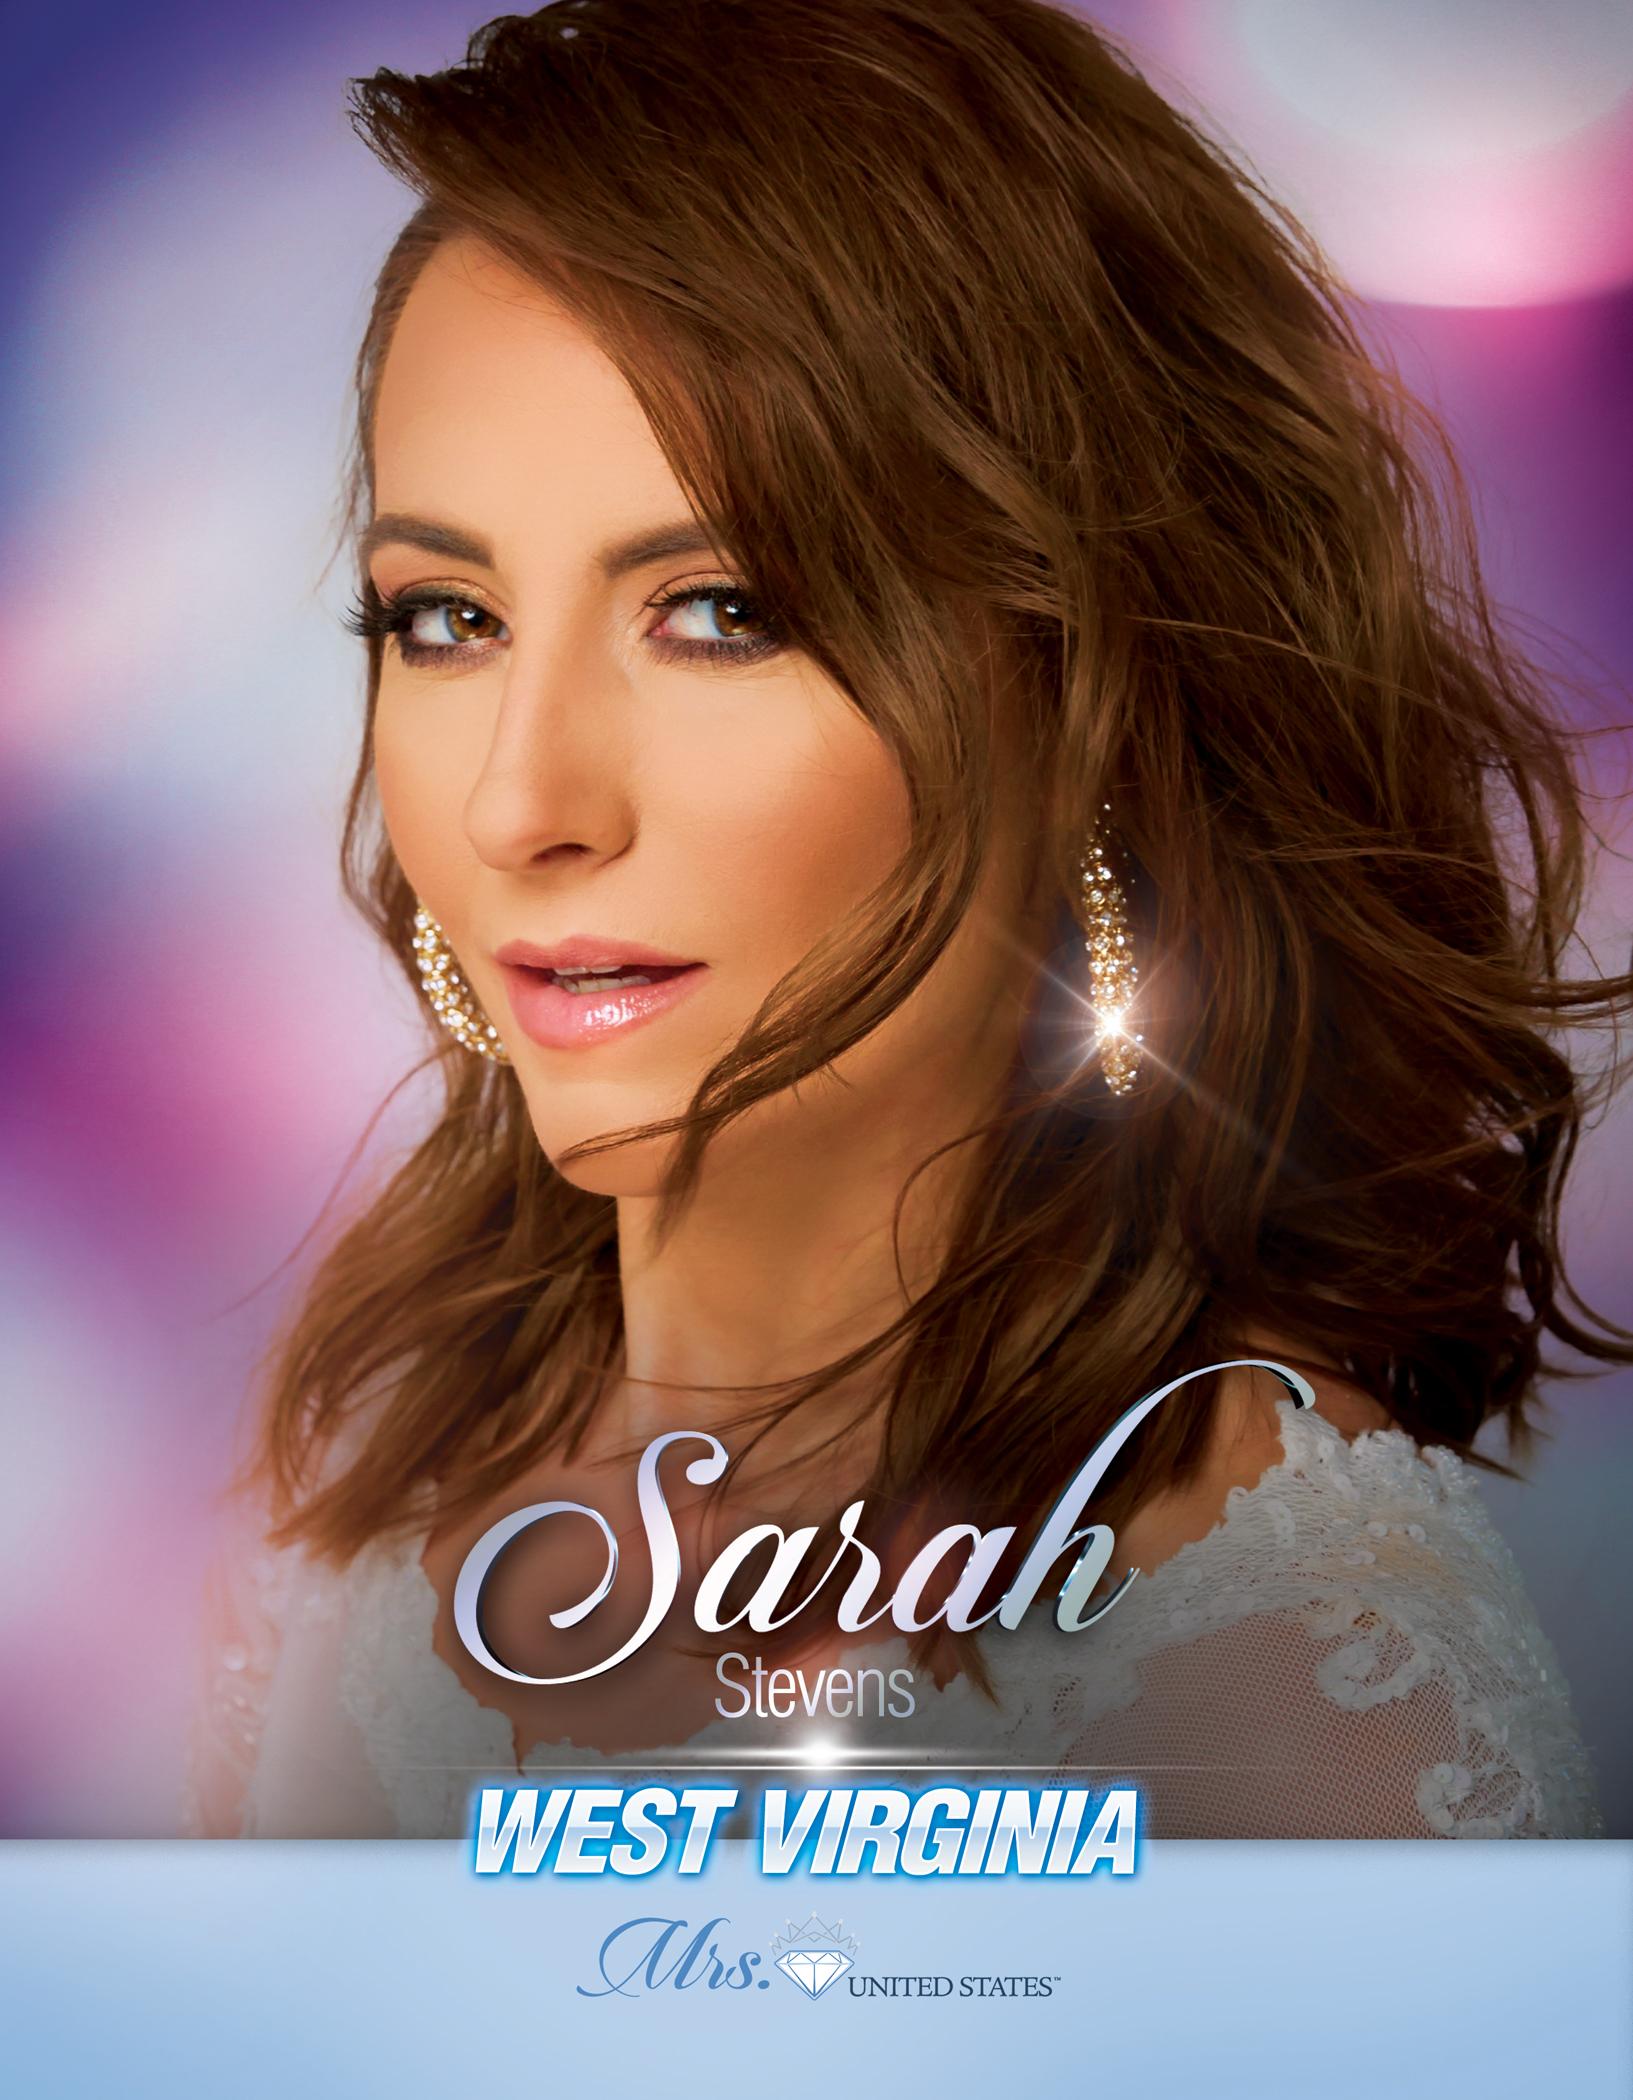 Sarah Stevens Mrs. West Virginia United States - 2019